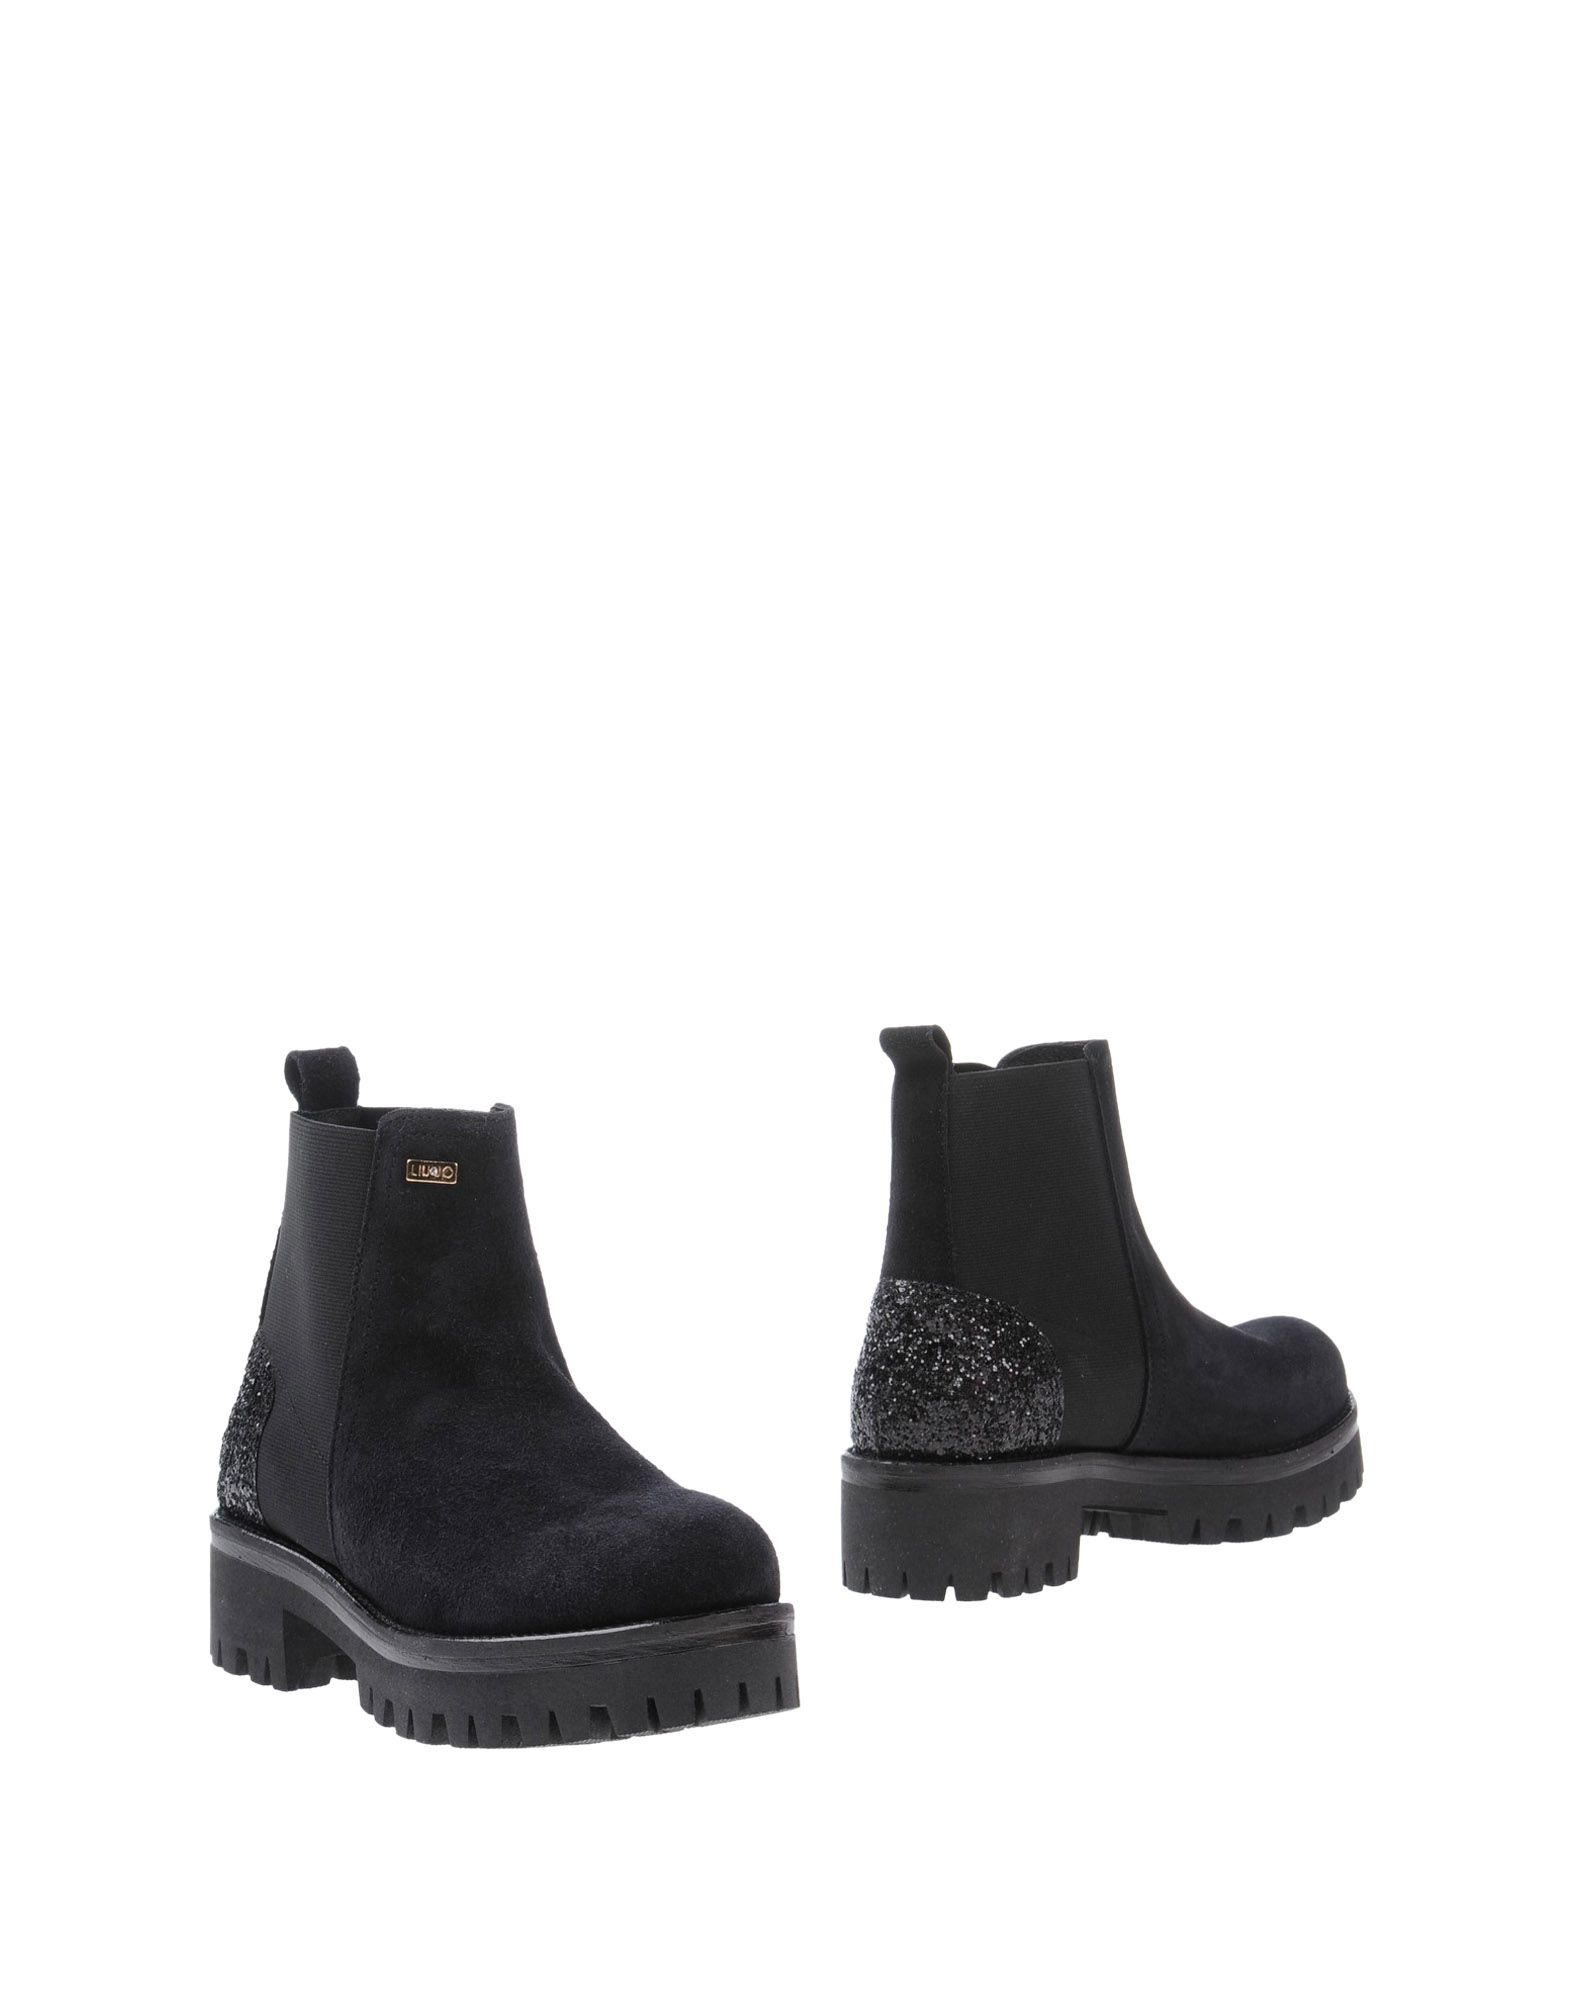 LIU •JO SHOES Полусапоги и высокие ботинки цены онлайн